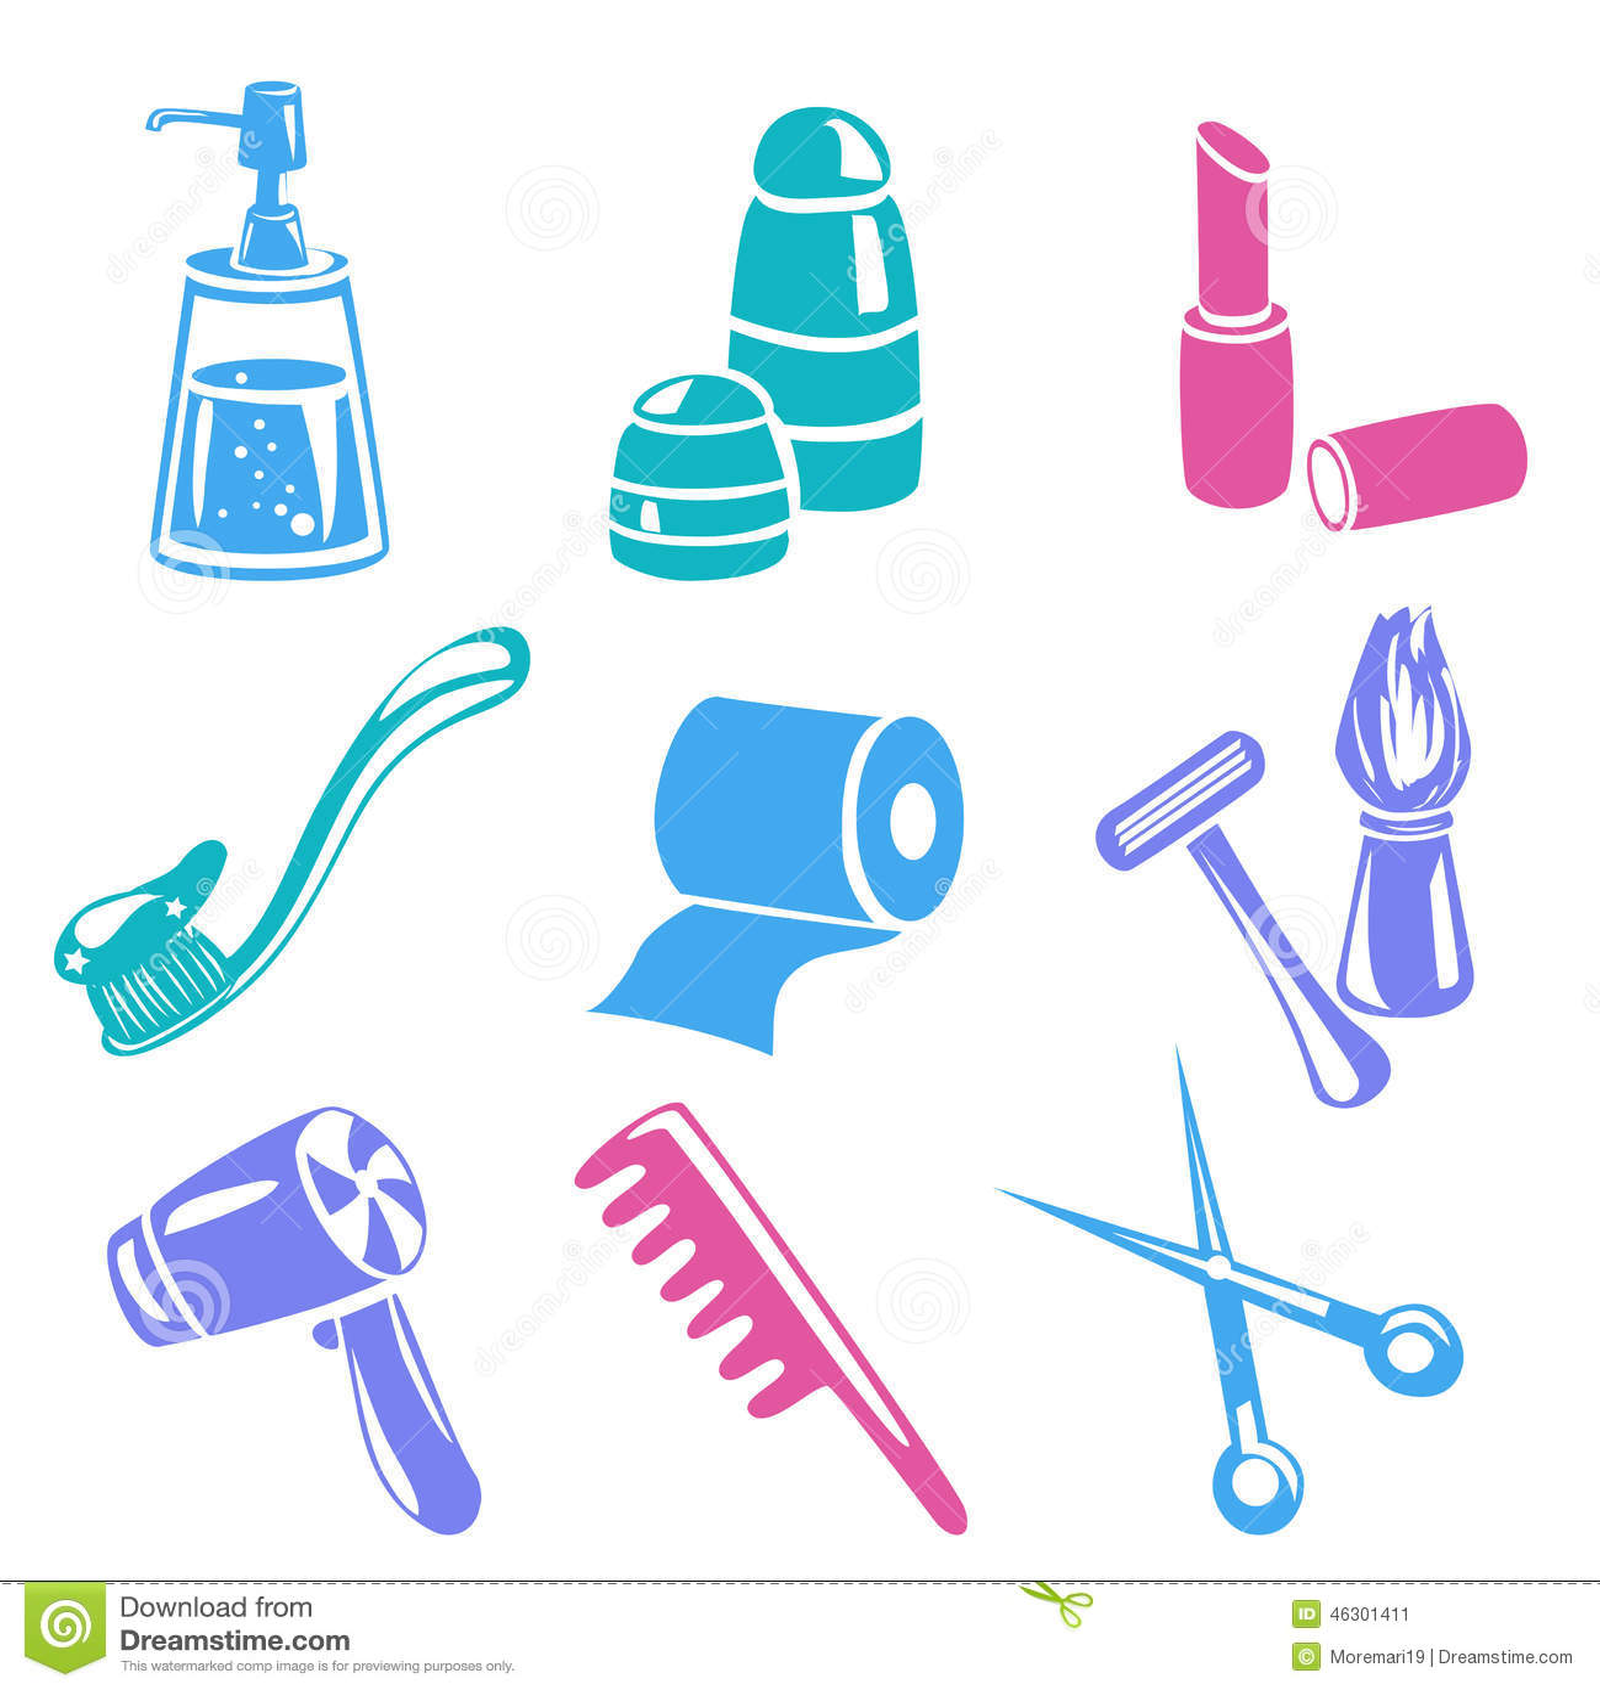 Set Of Vector Bathroom And Personal Hygiene Items Cartoon